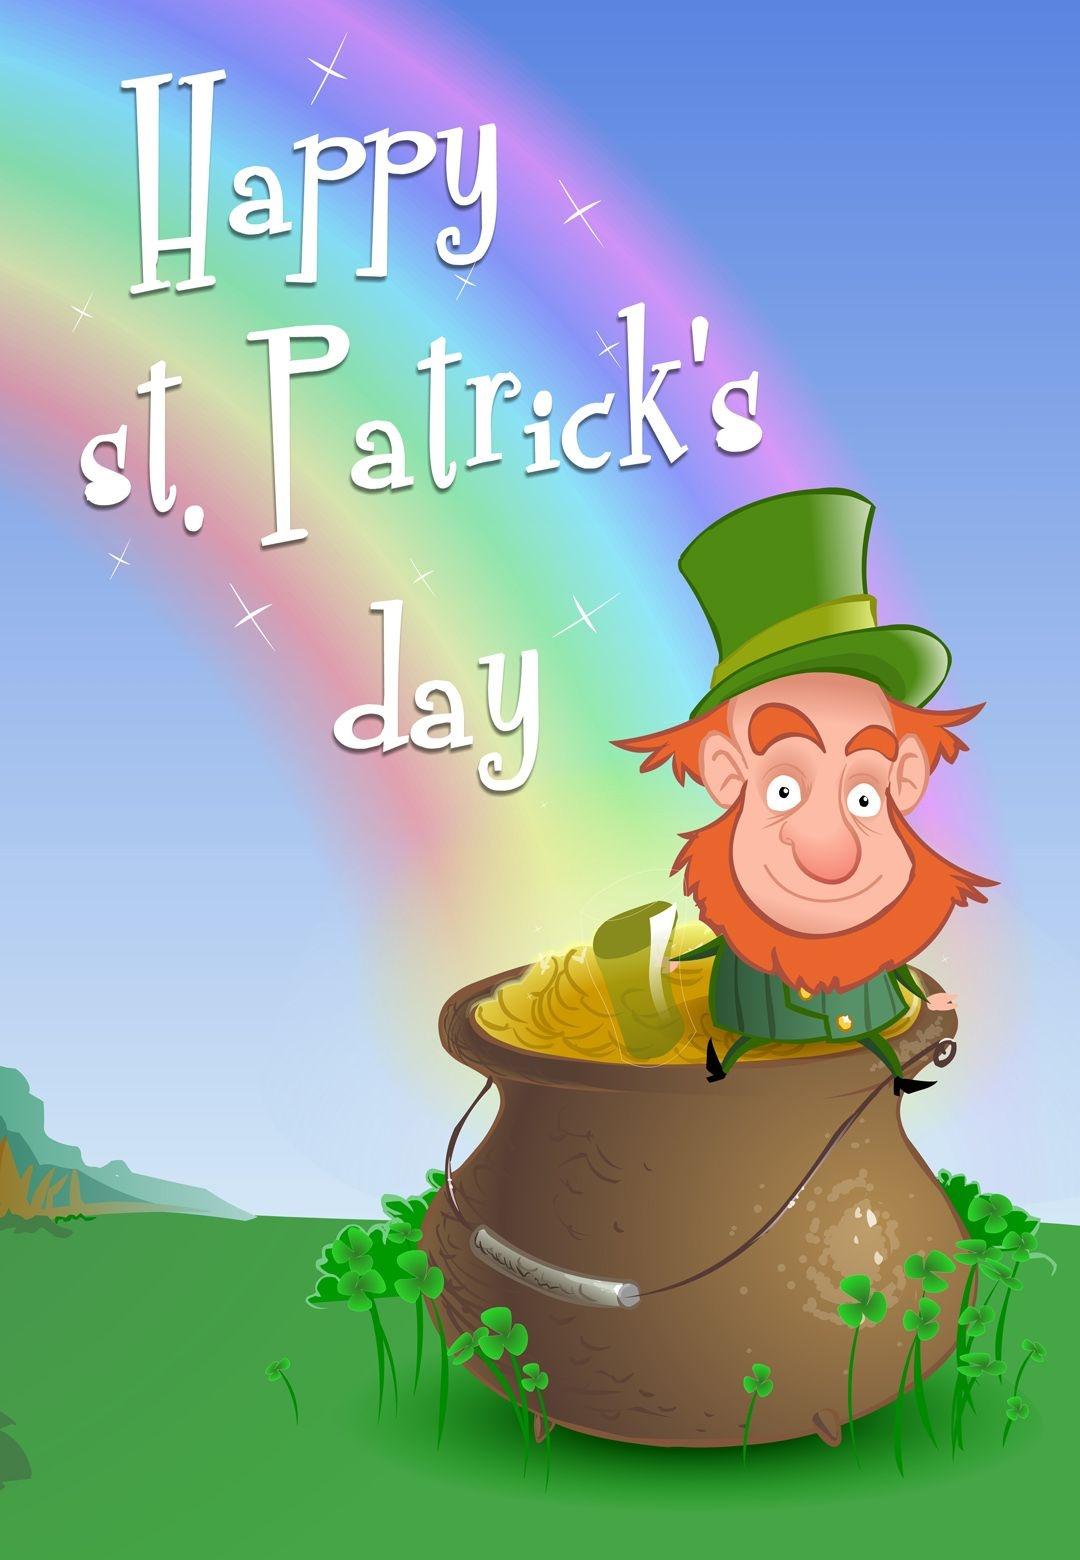 Free Printable Leprechaun Wishing St Patrick's Day Greeting Card - Free Printable St Patrick's Day Greeting Cards